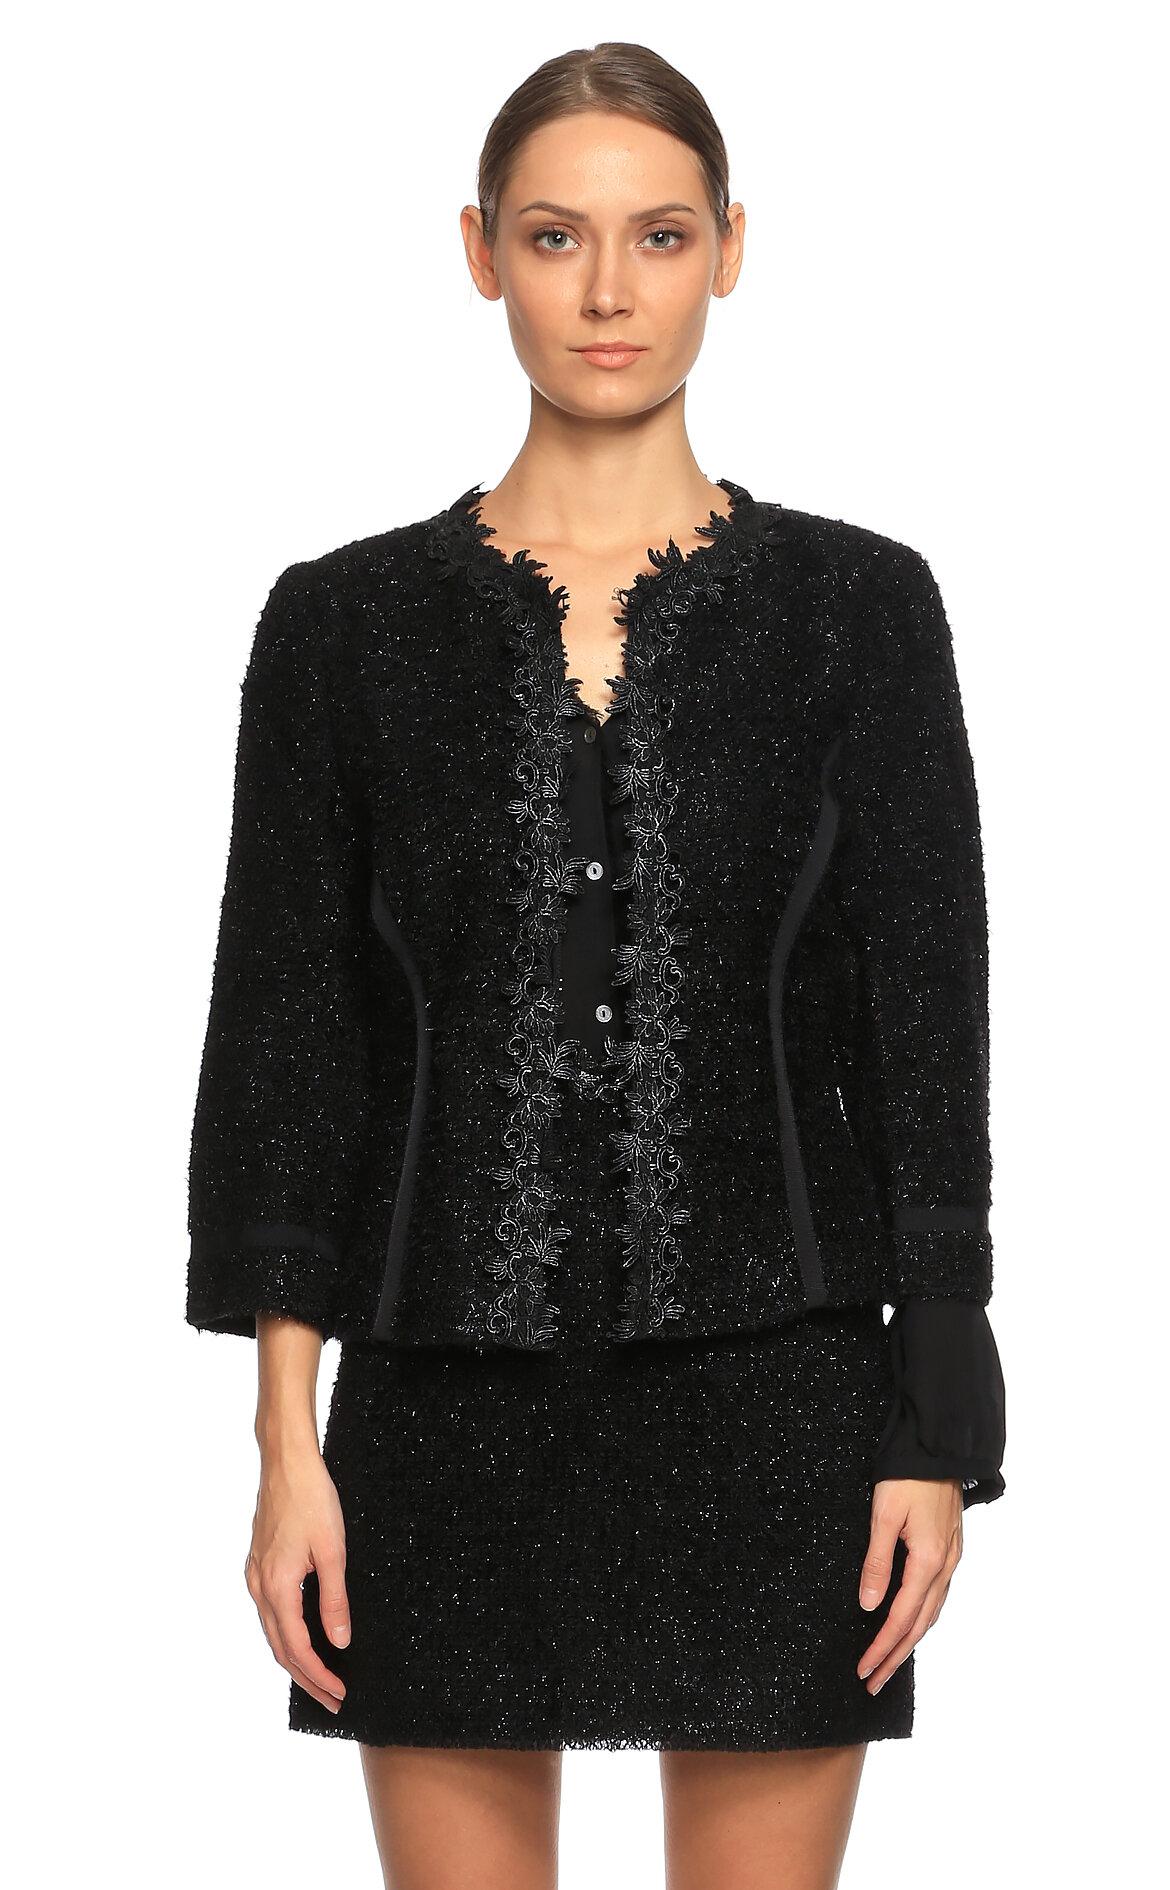 Ferre-Ferre İşleme Detaylı Siyah Ceket